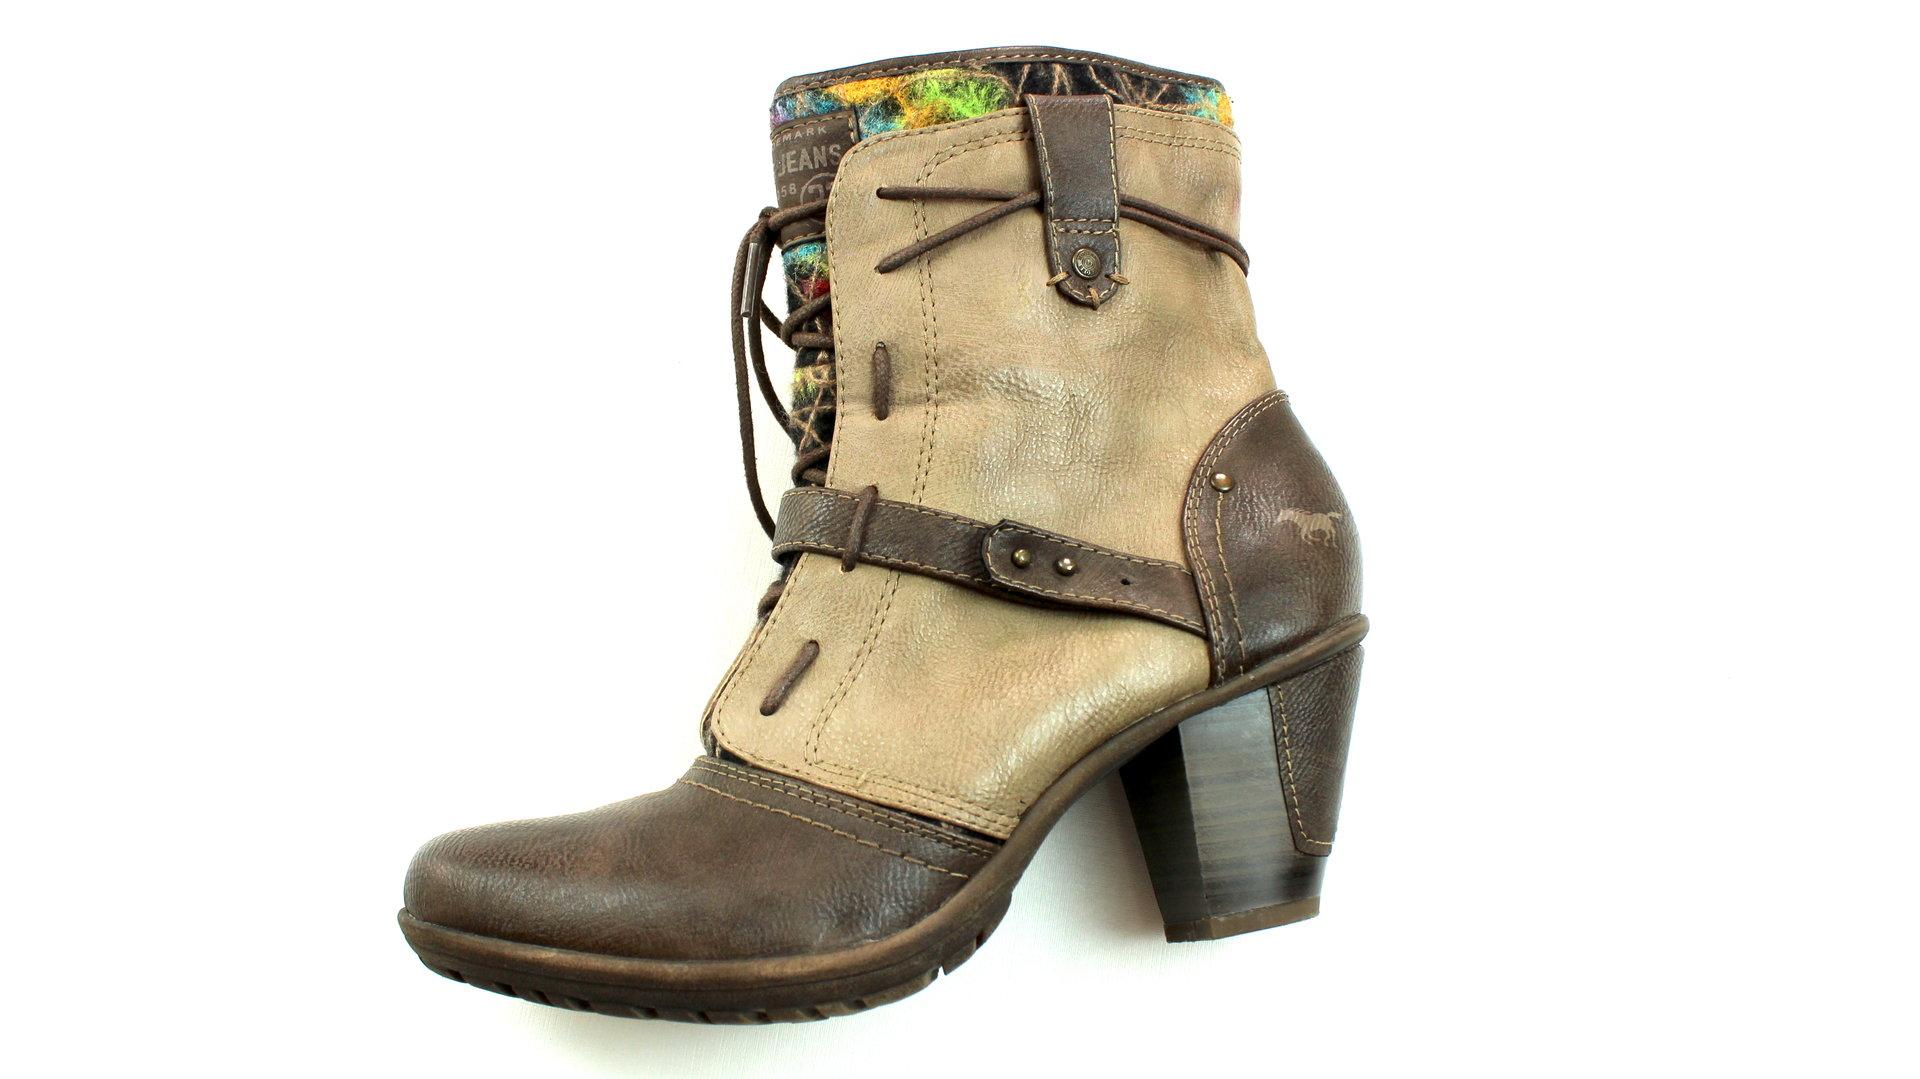 quality design 10f66 2272f MUSTANG Stiefeletten Boots Damen Schnürer braun 40